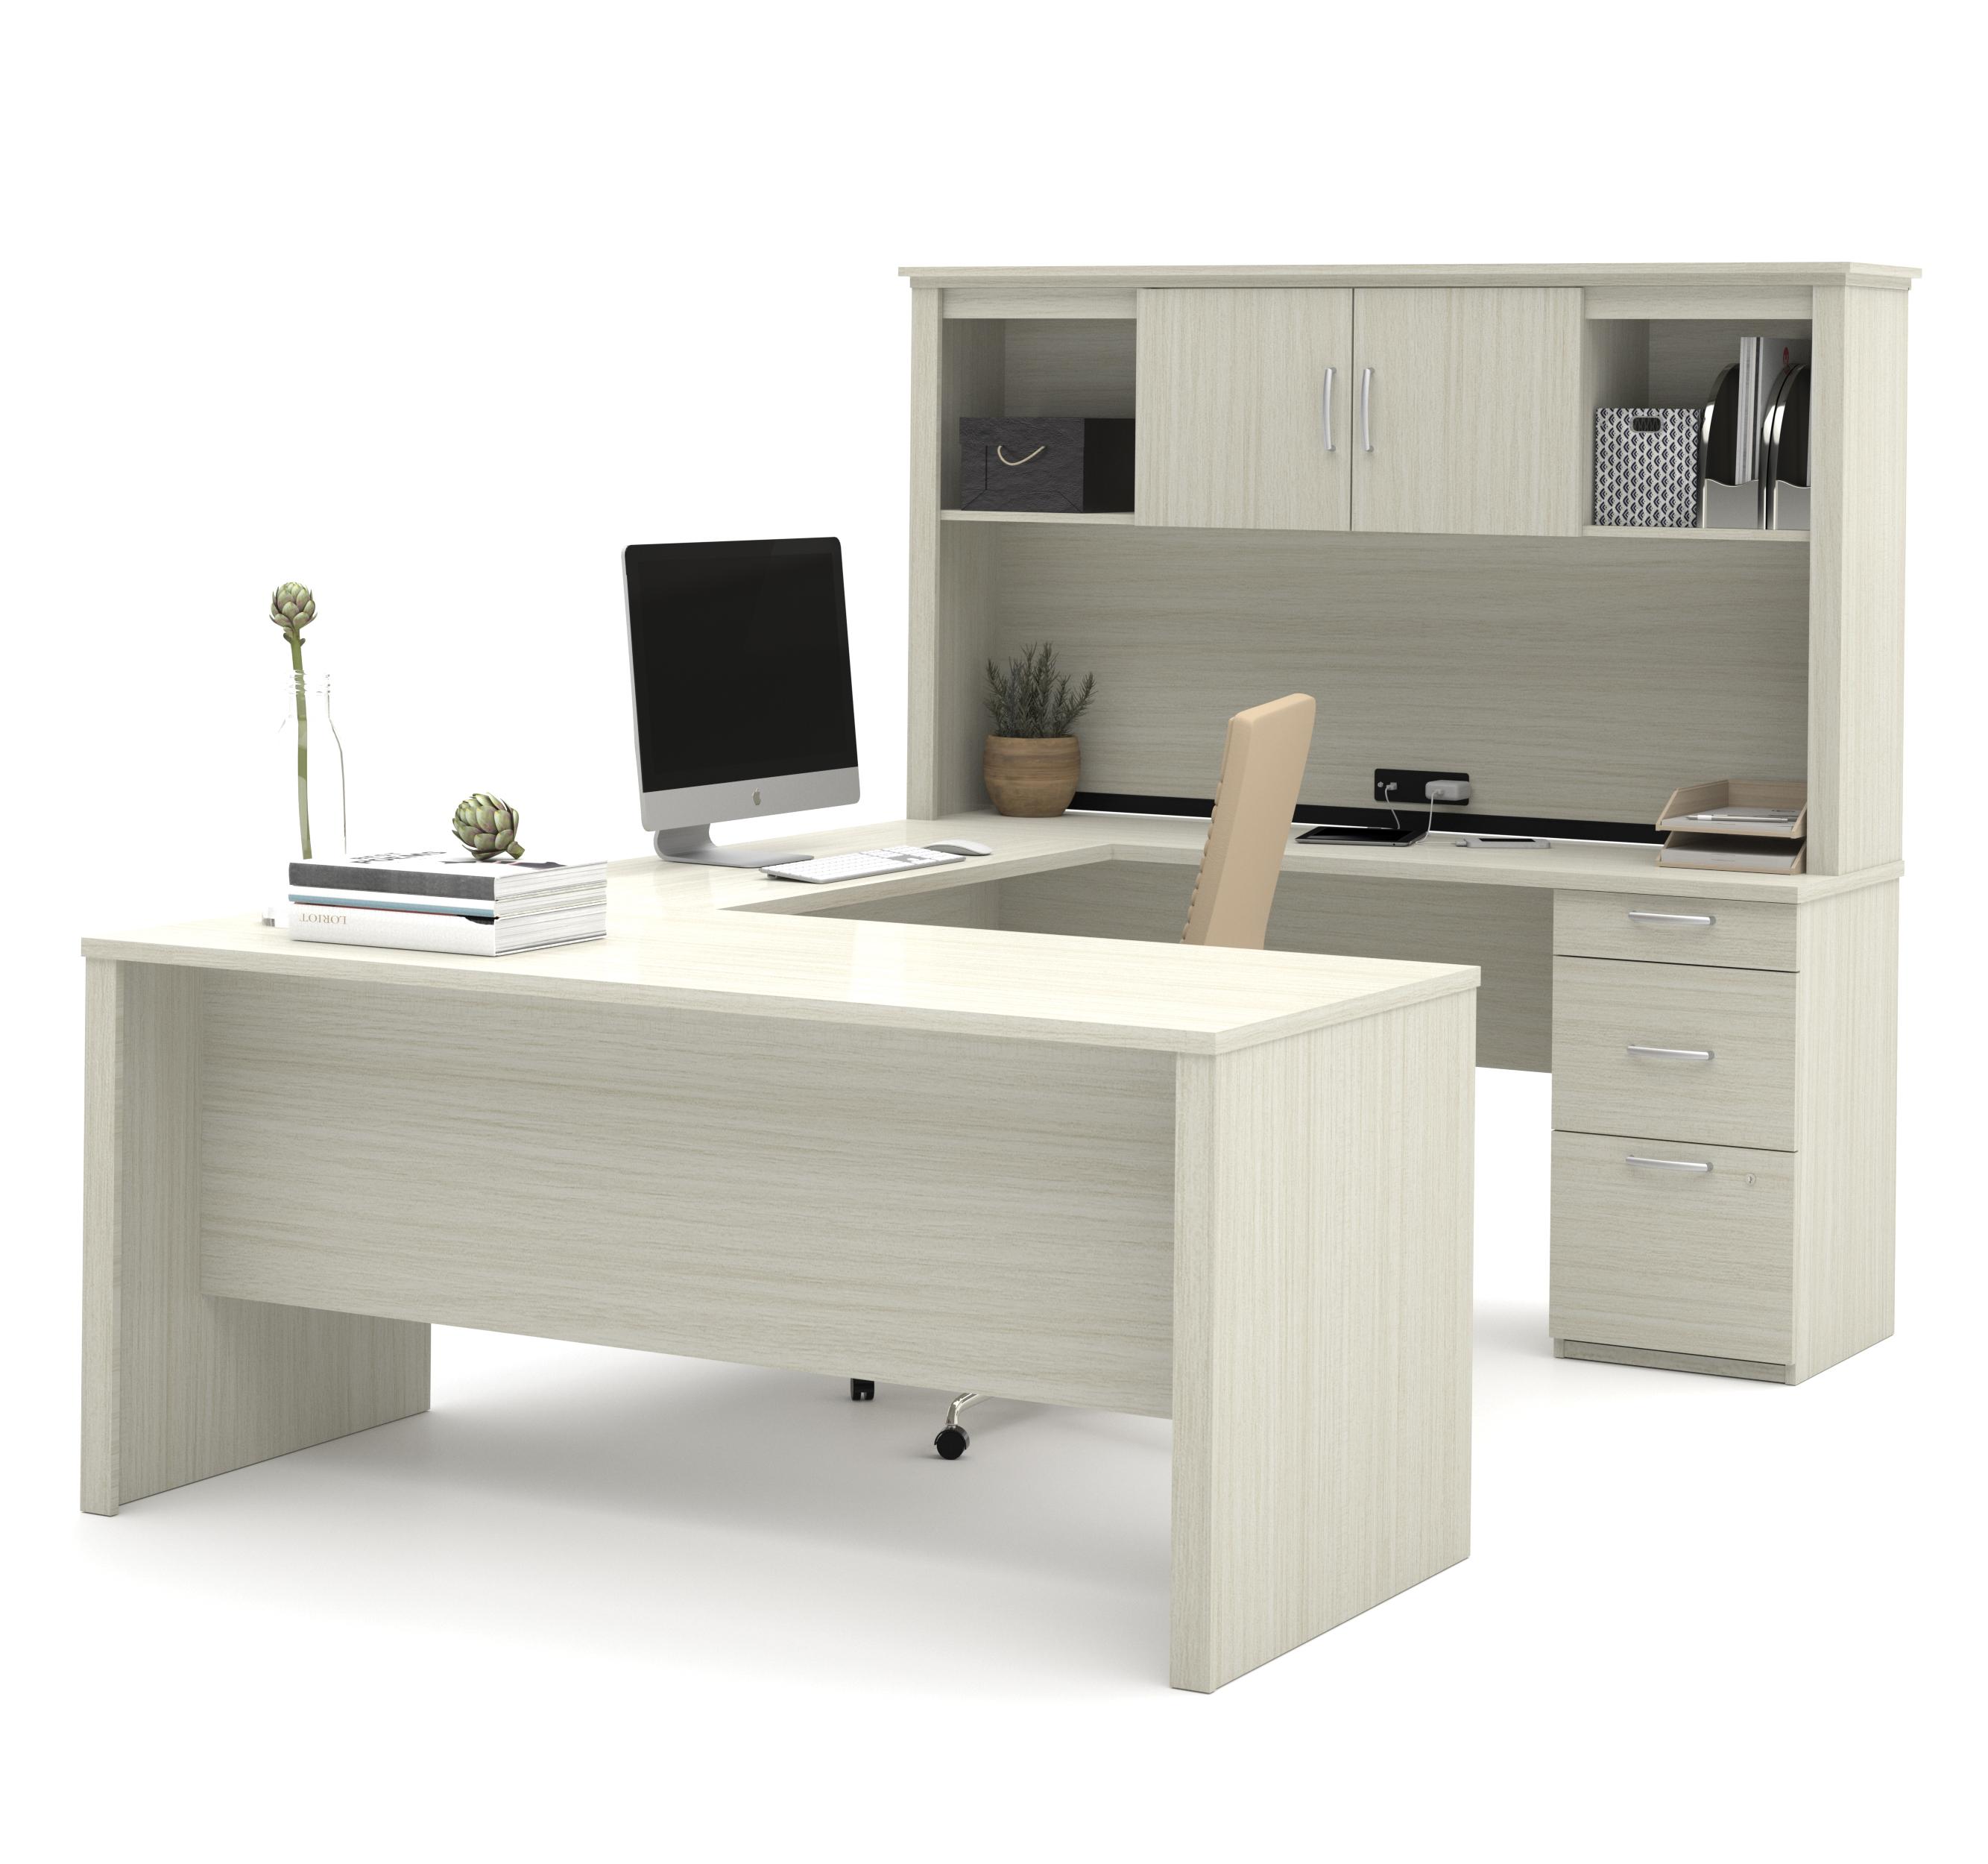 Bestar Logan U-Shaped Desk in White Chocolate